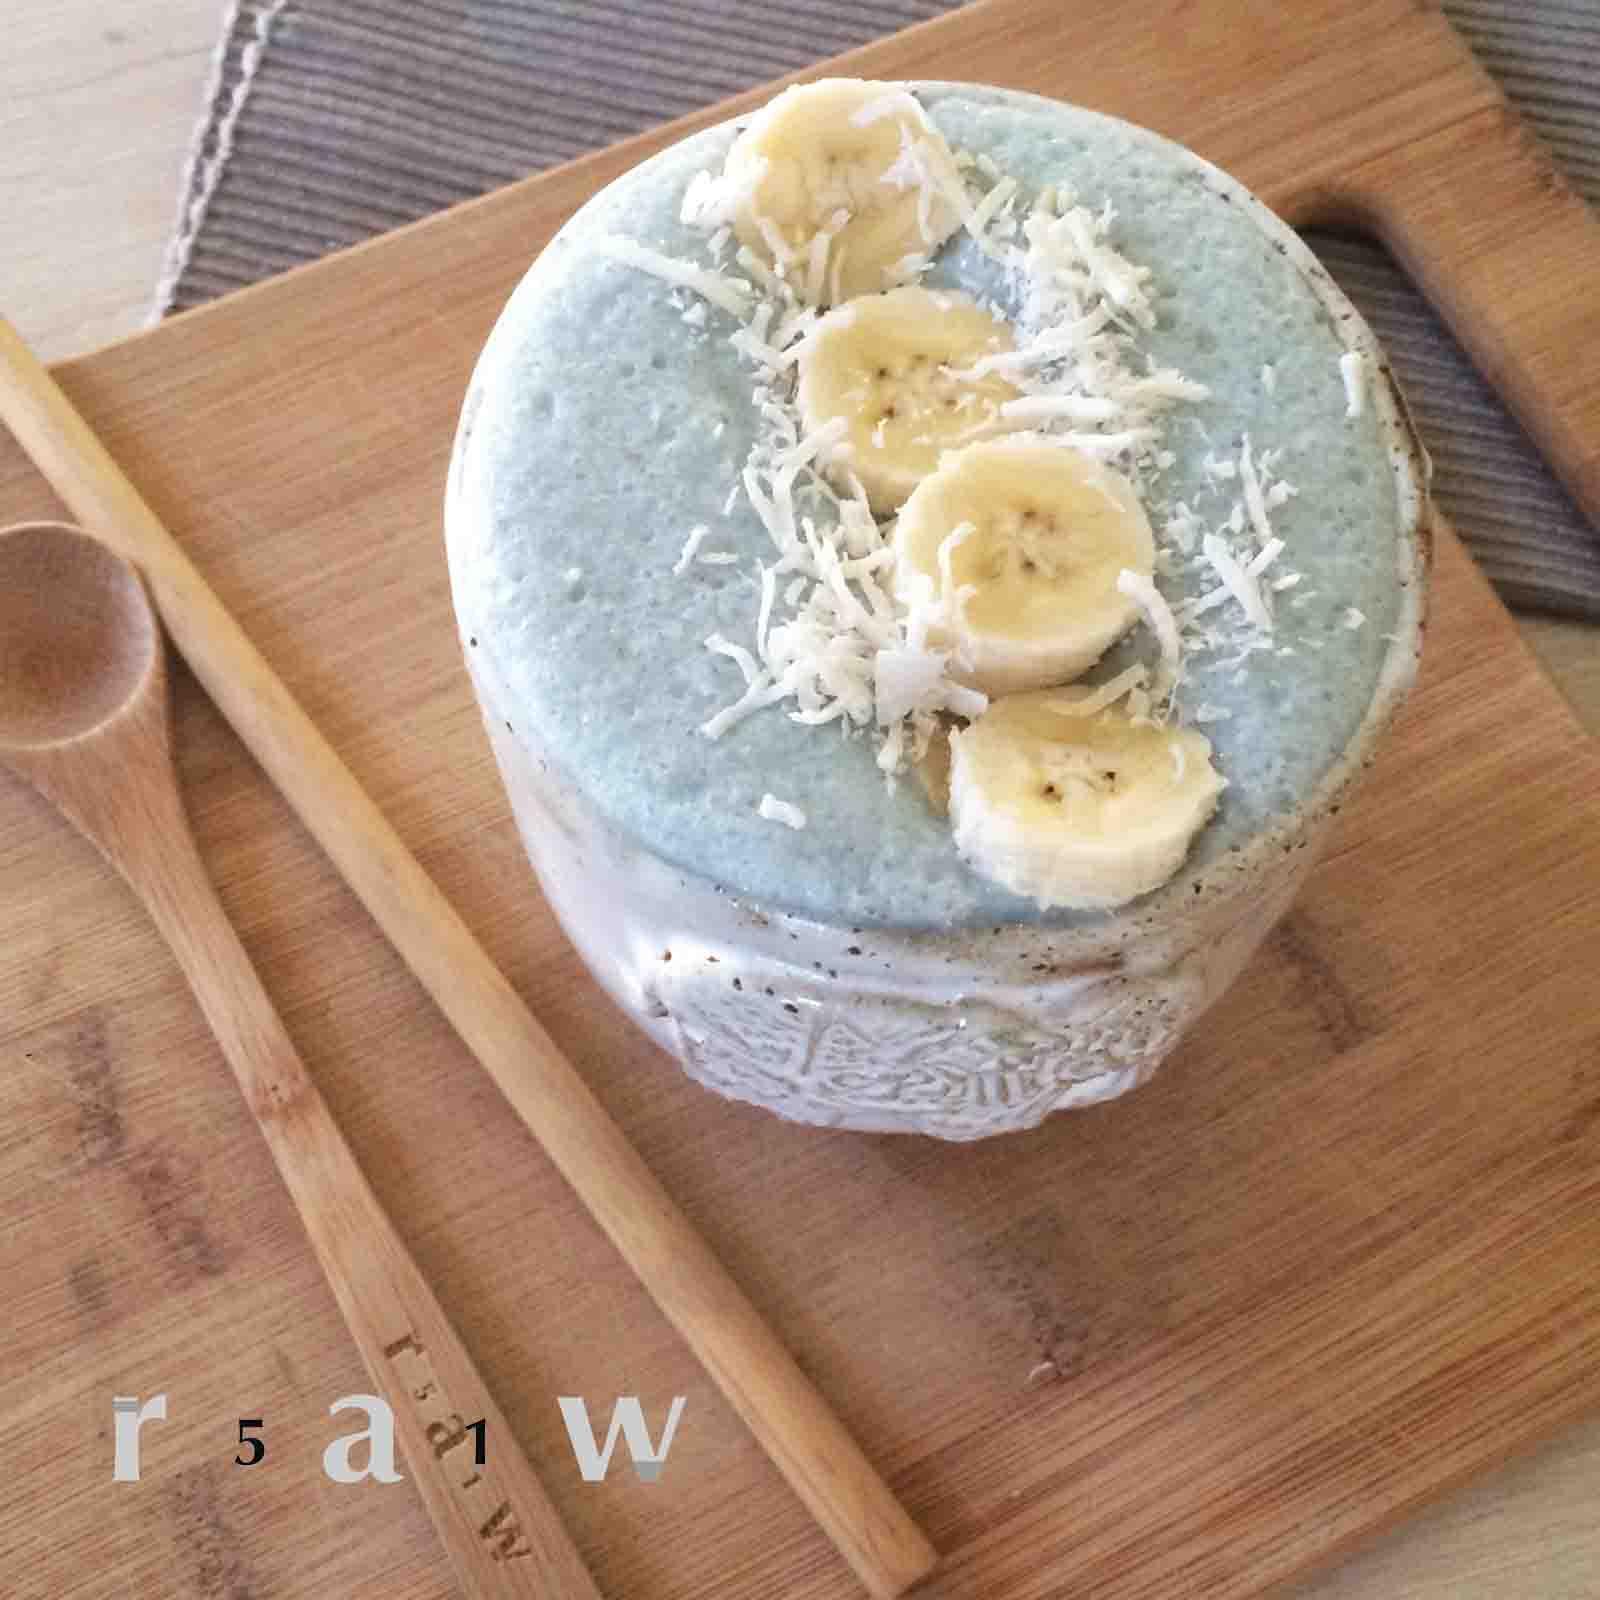 51raw.com-E3Live-BlueMajik-Creamy-Coconut-Banana-Power-Smoothie-Raw-Food-Diet.jpg